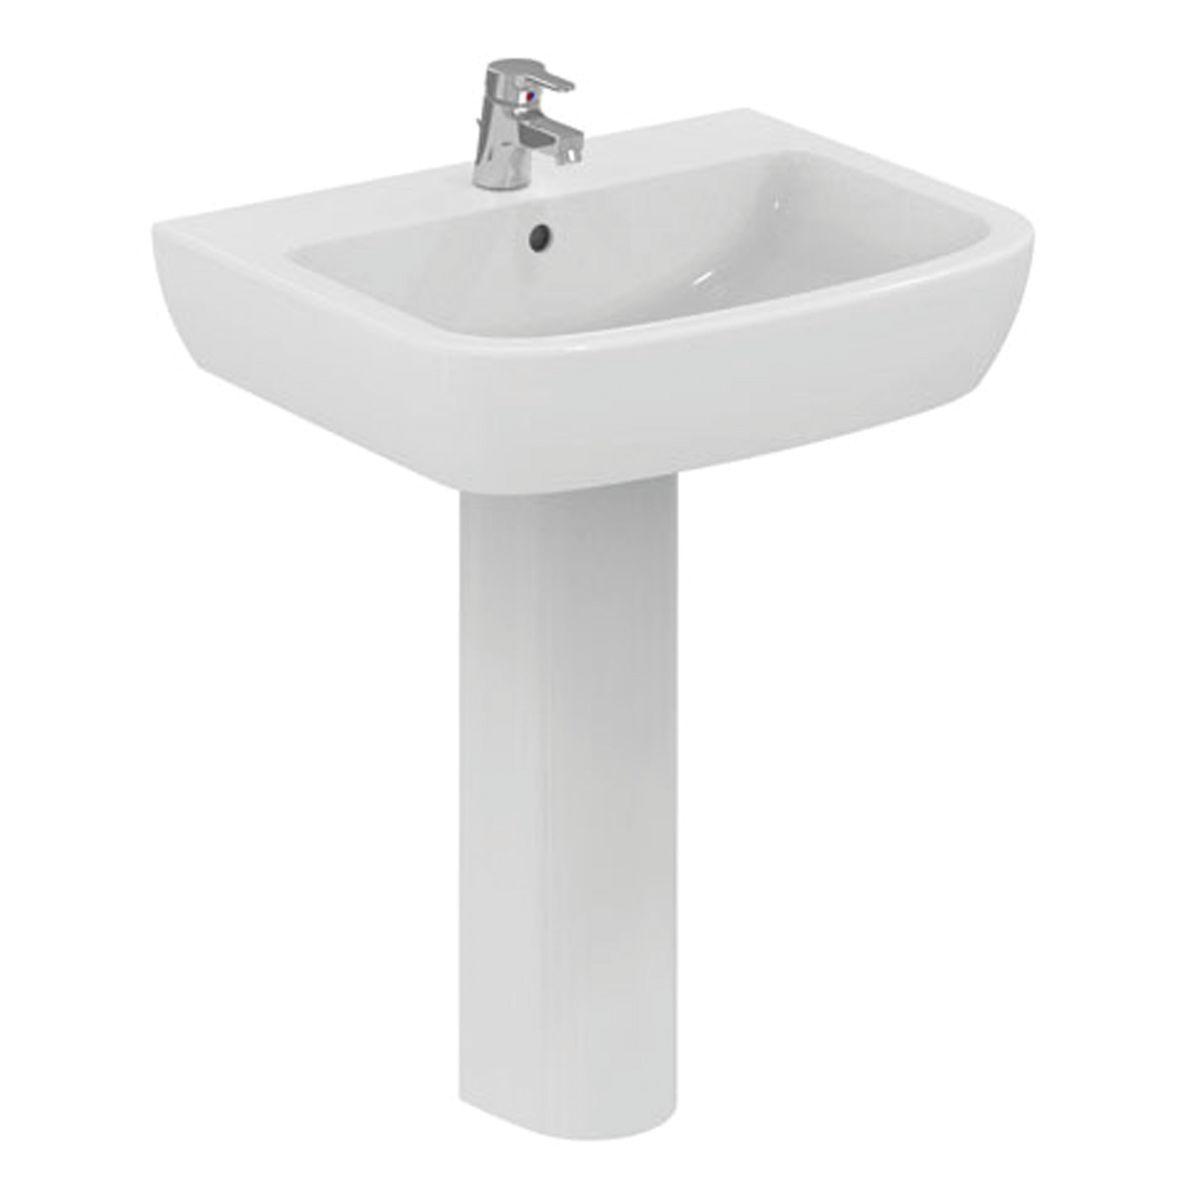 lavabo retro leroy merlin leroy merlin meuble salle de bain neo pin meuble sous vasque wc. Black Bedroom Furniture Sets. Home Design Ideas